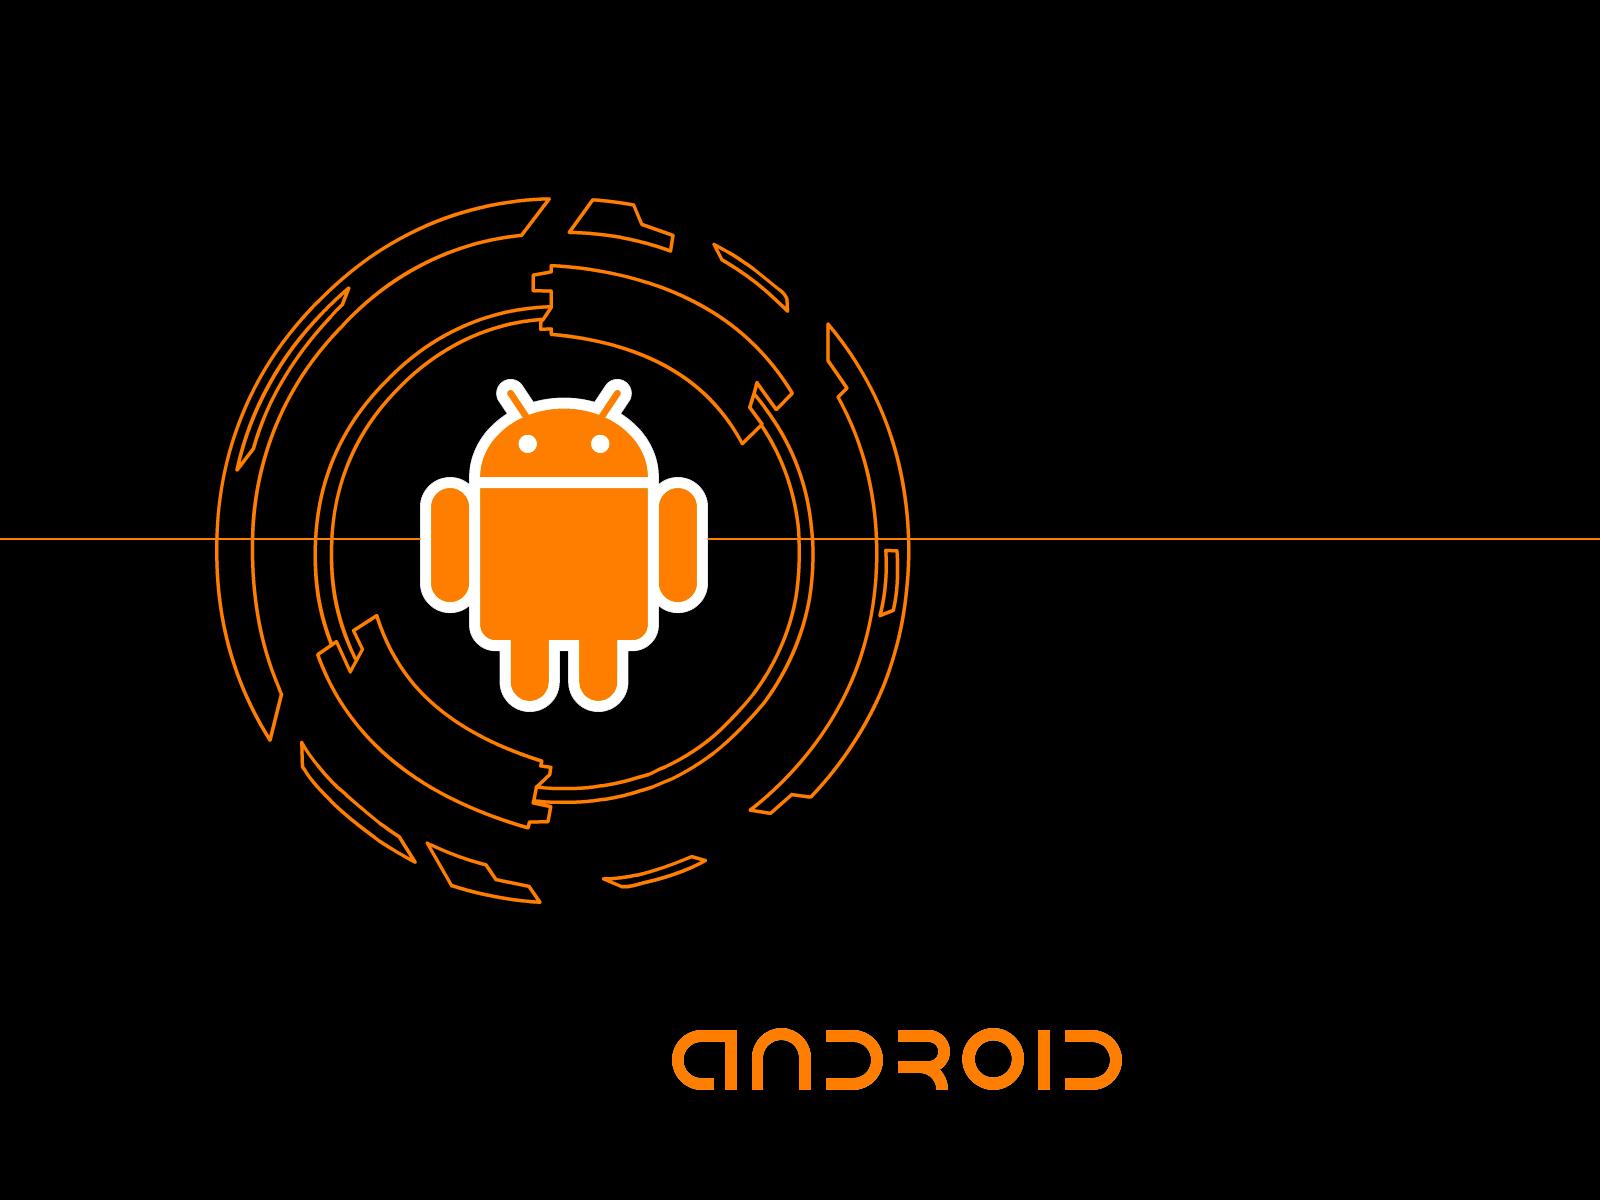 black wallpaper android all black wallpaper android rare black 1600x1200